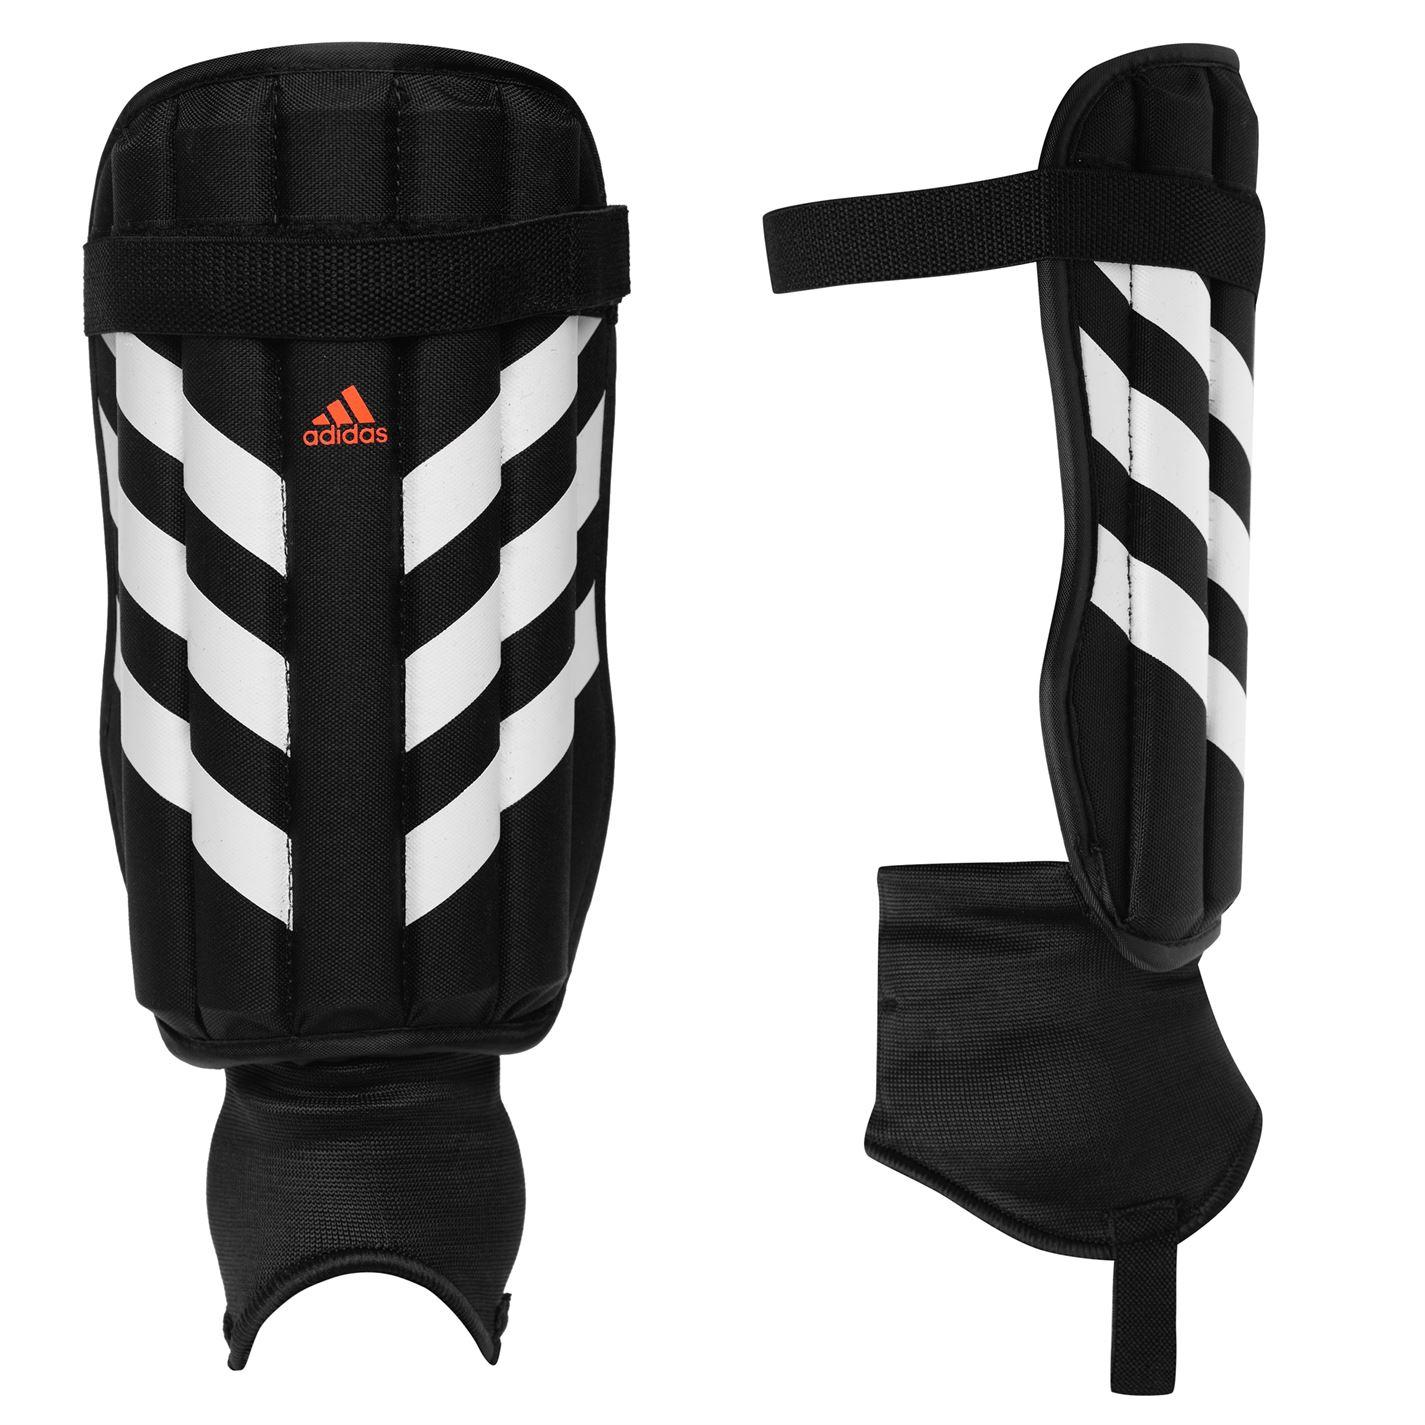 adidas F50 Lite Shin Guards